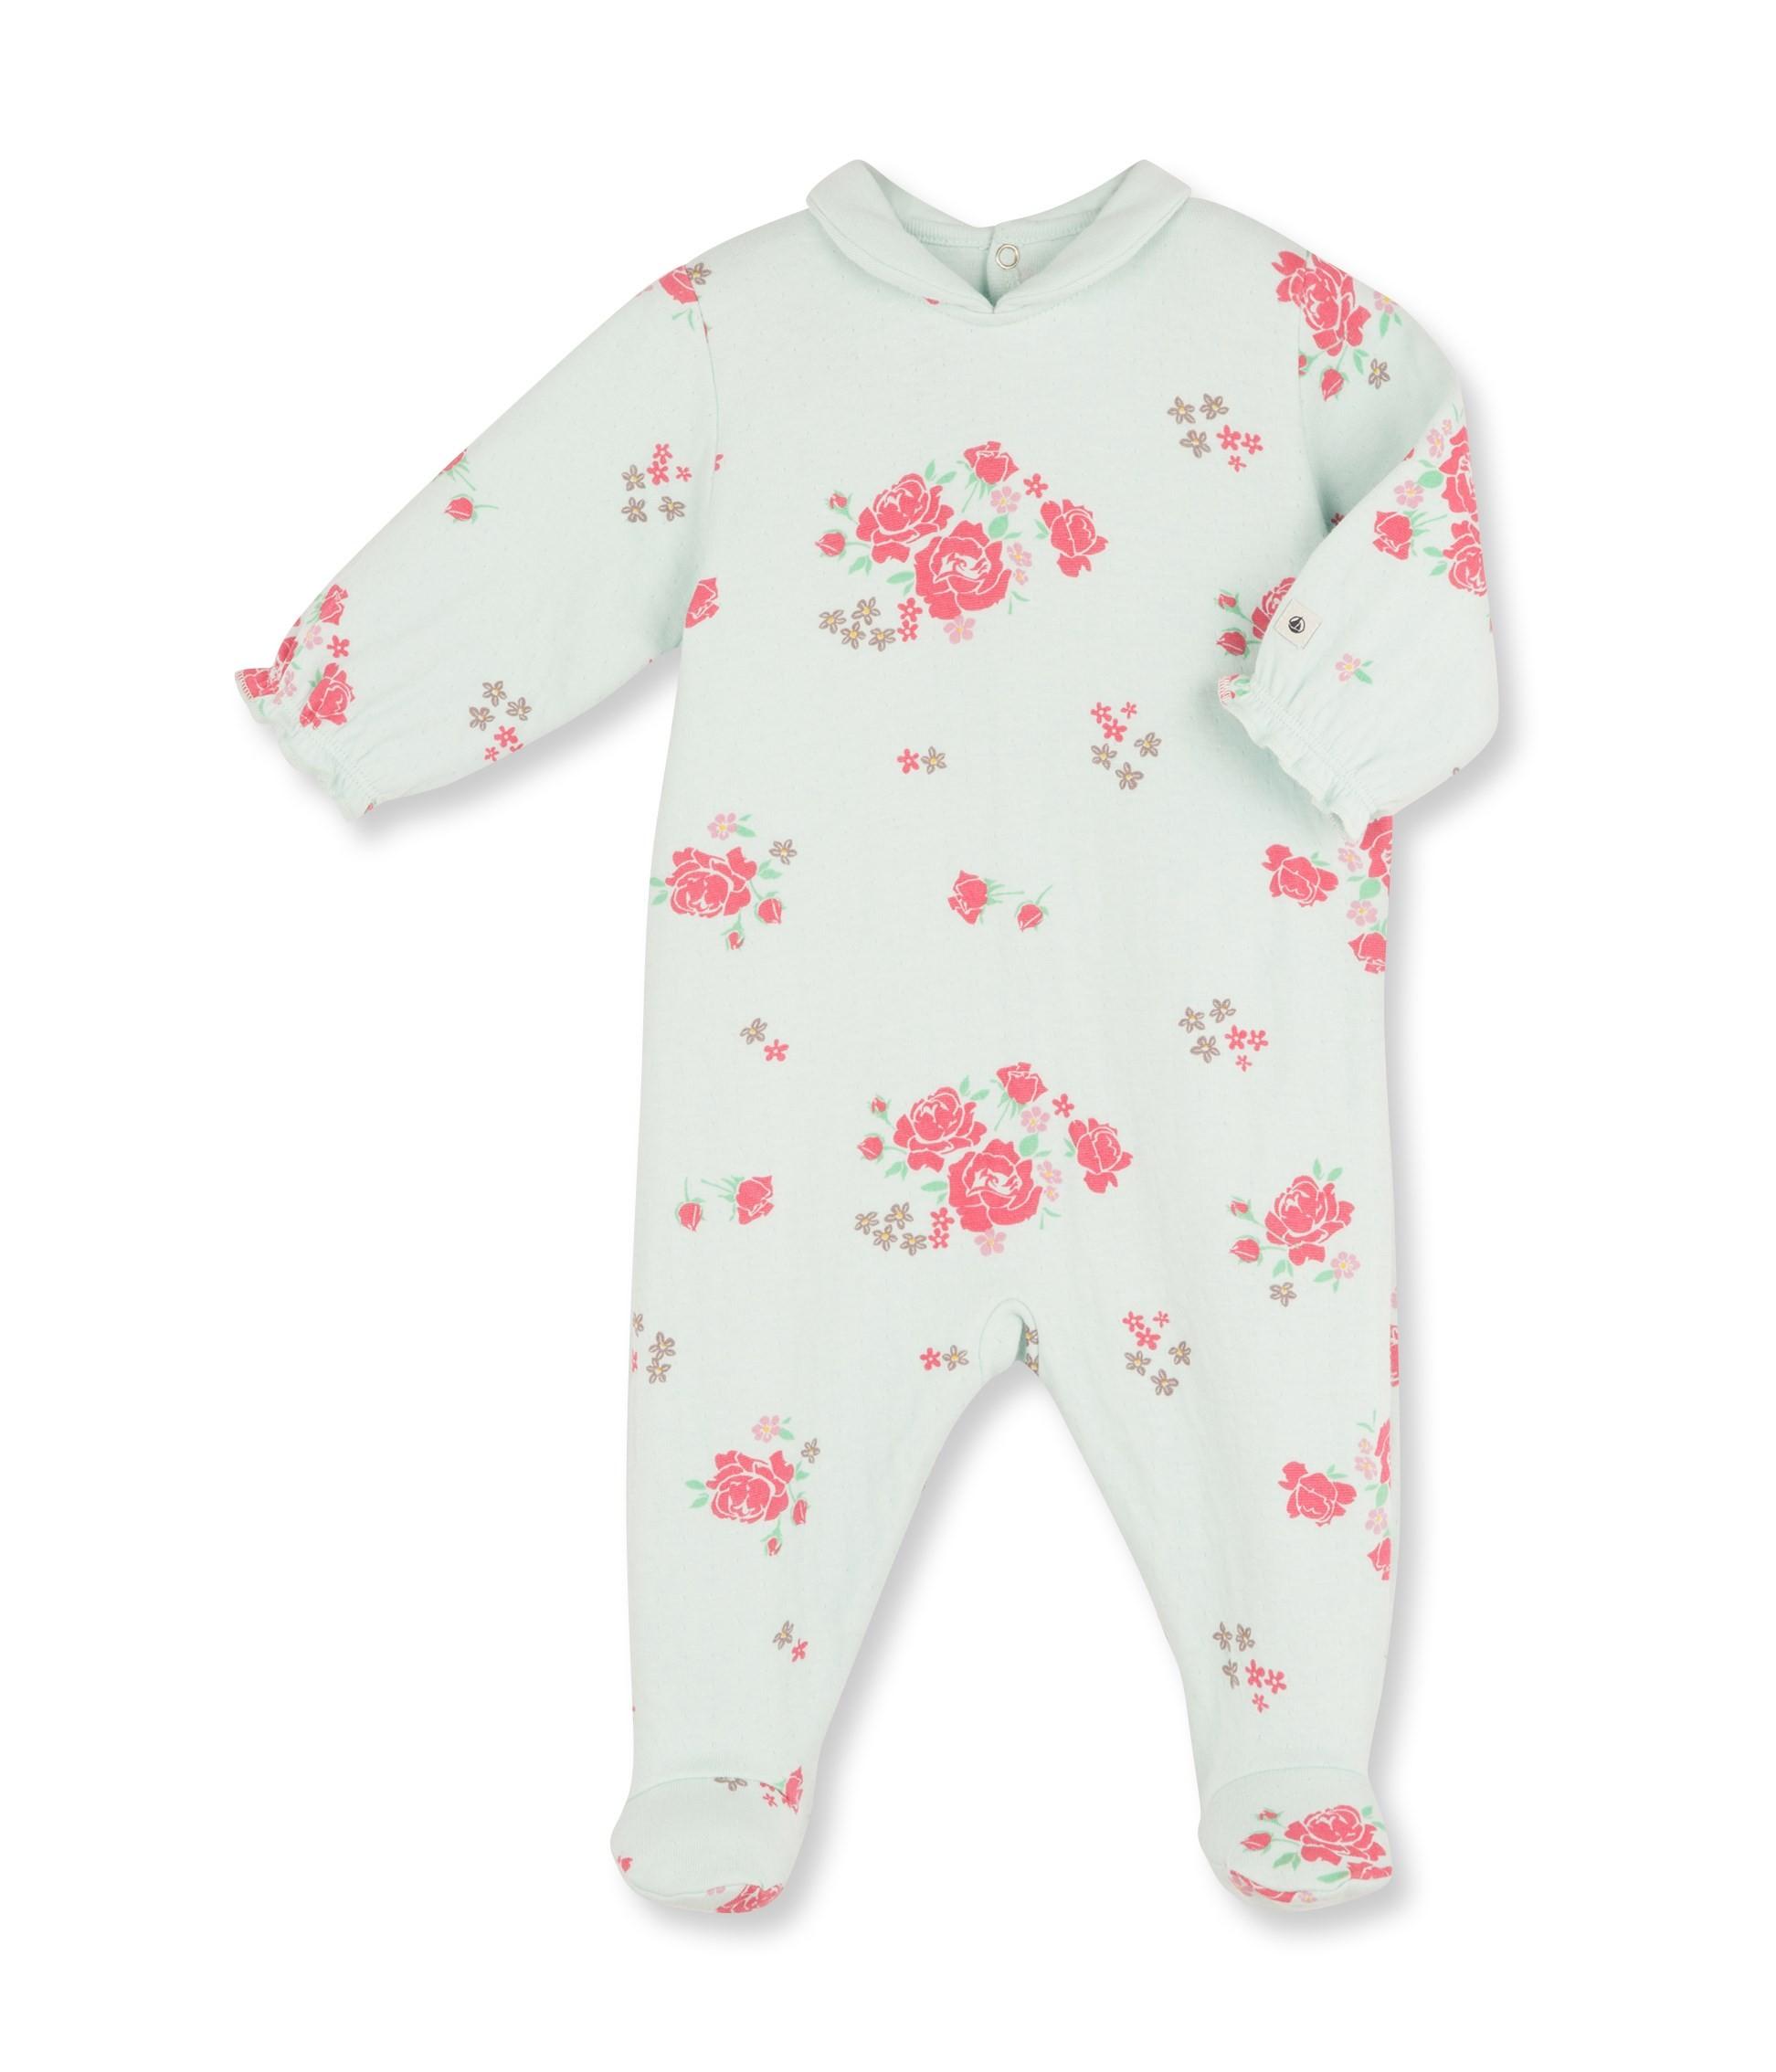 Baby girl rose print sleepsuit with Peter Pan collar petit bateau